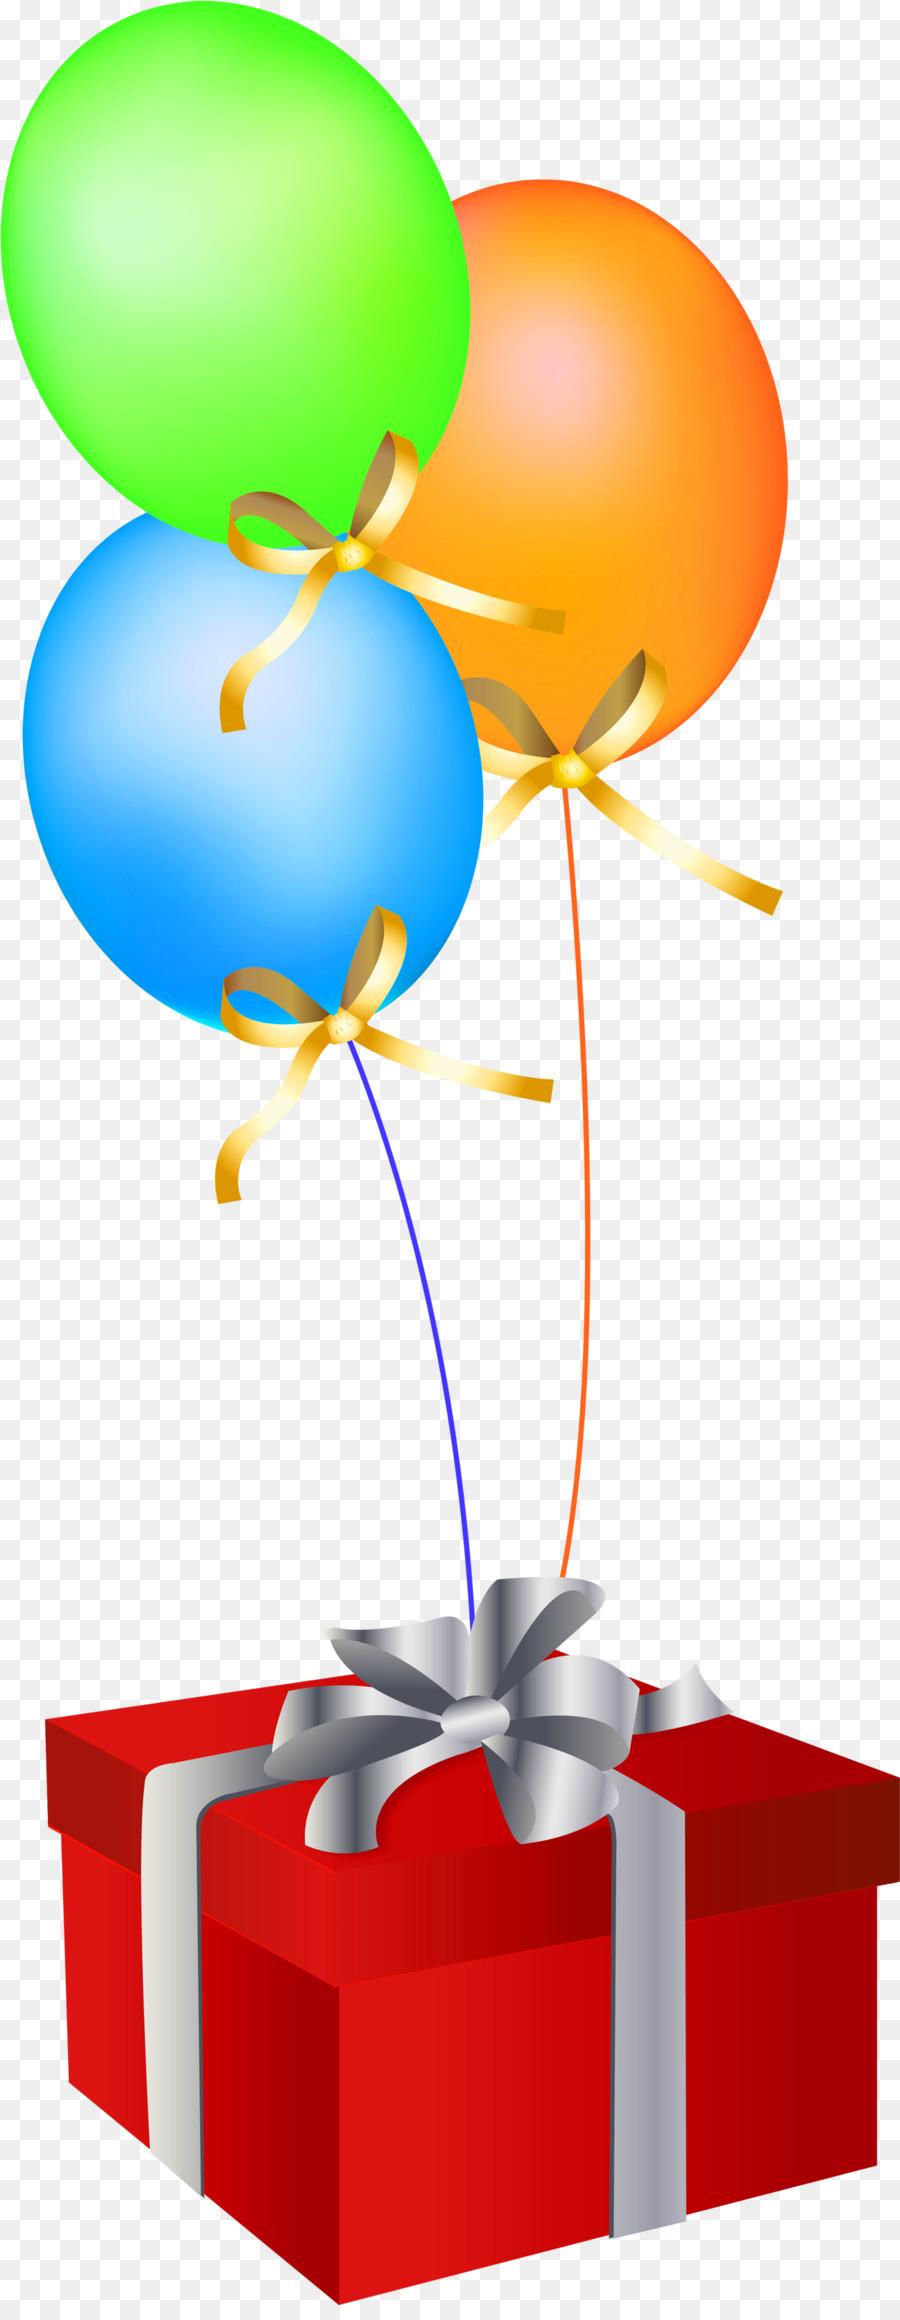 Счастлива, открытки с шариками и подарками